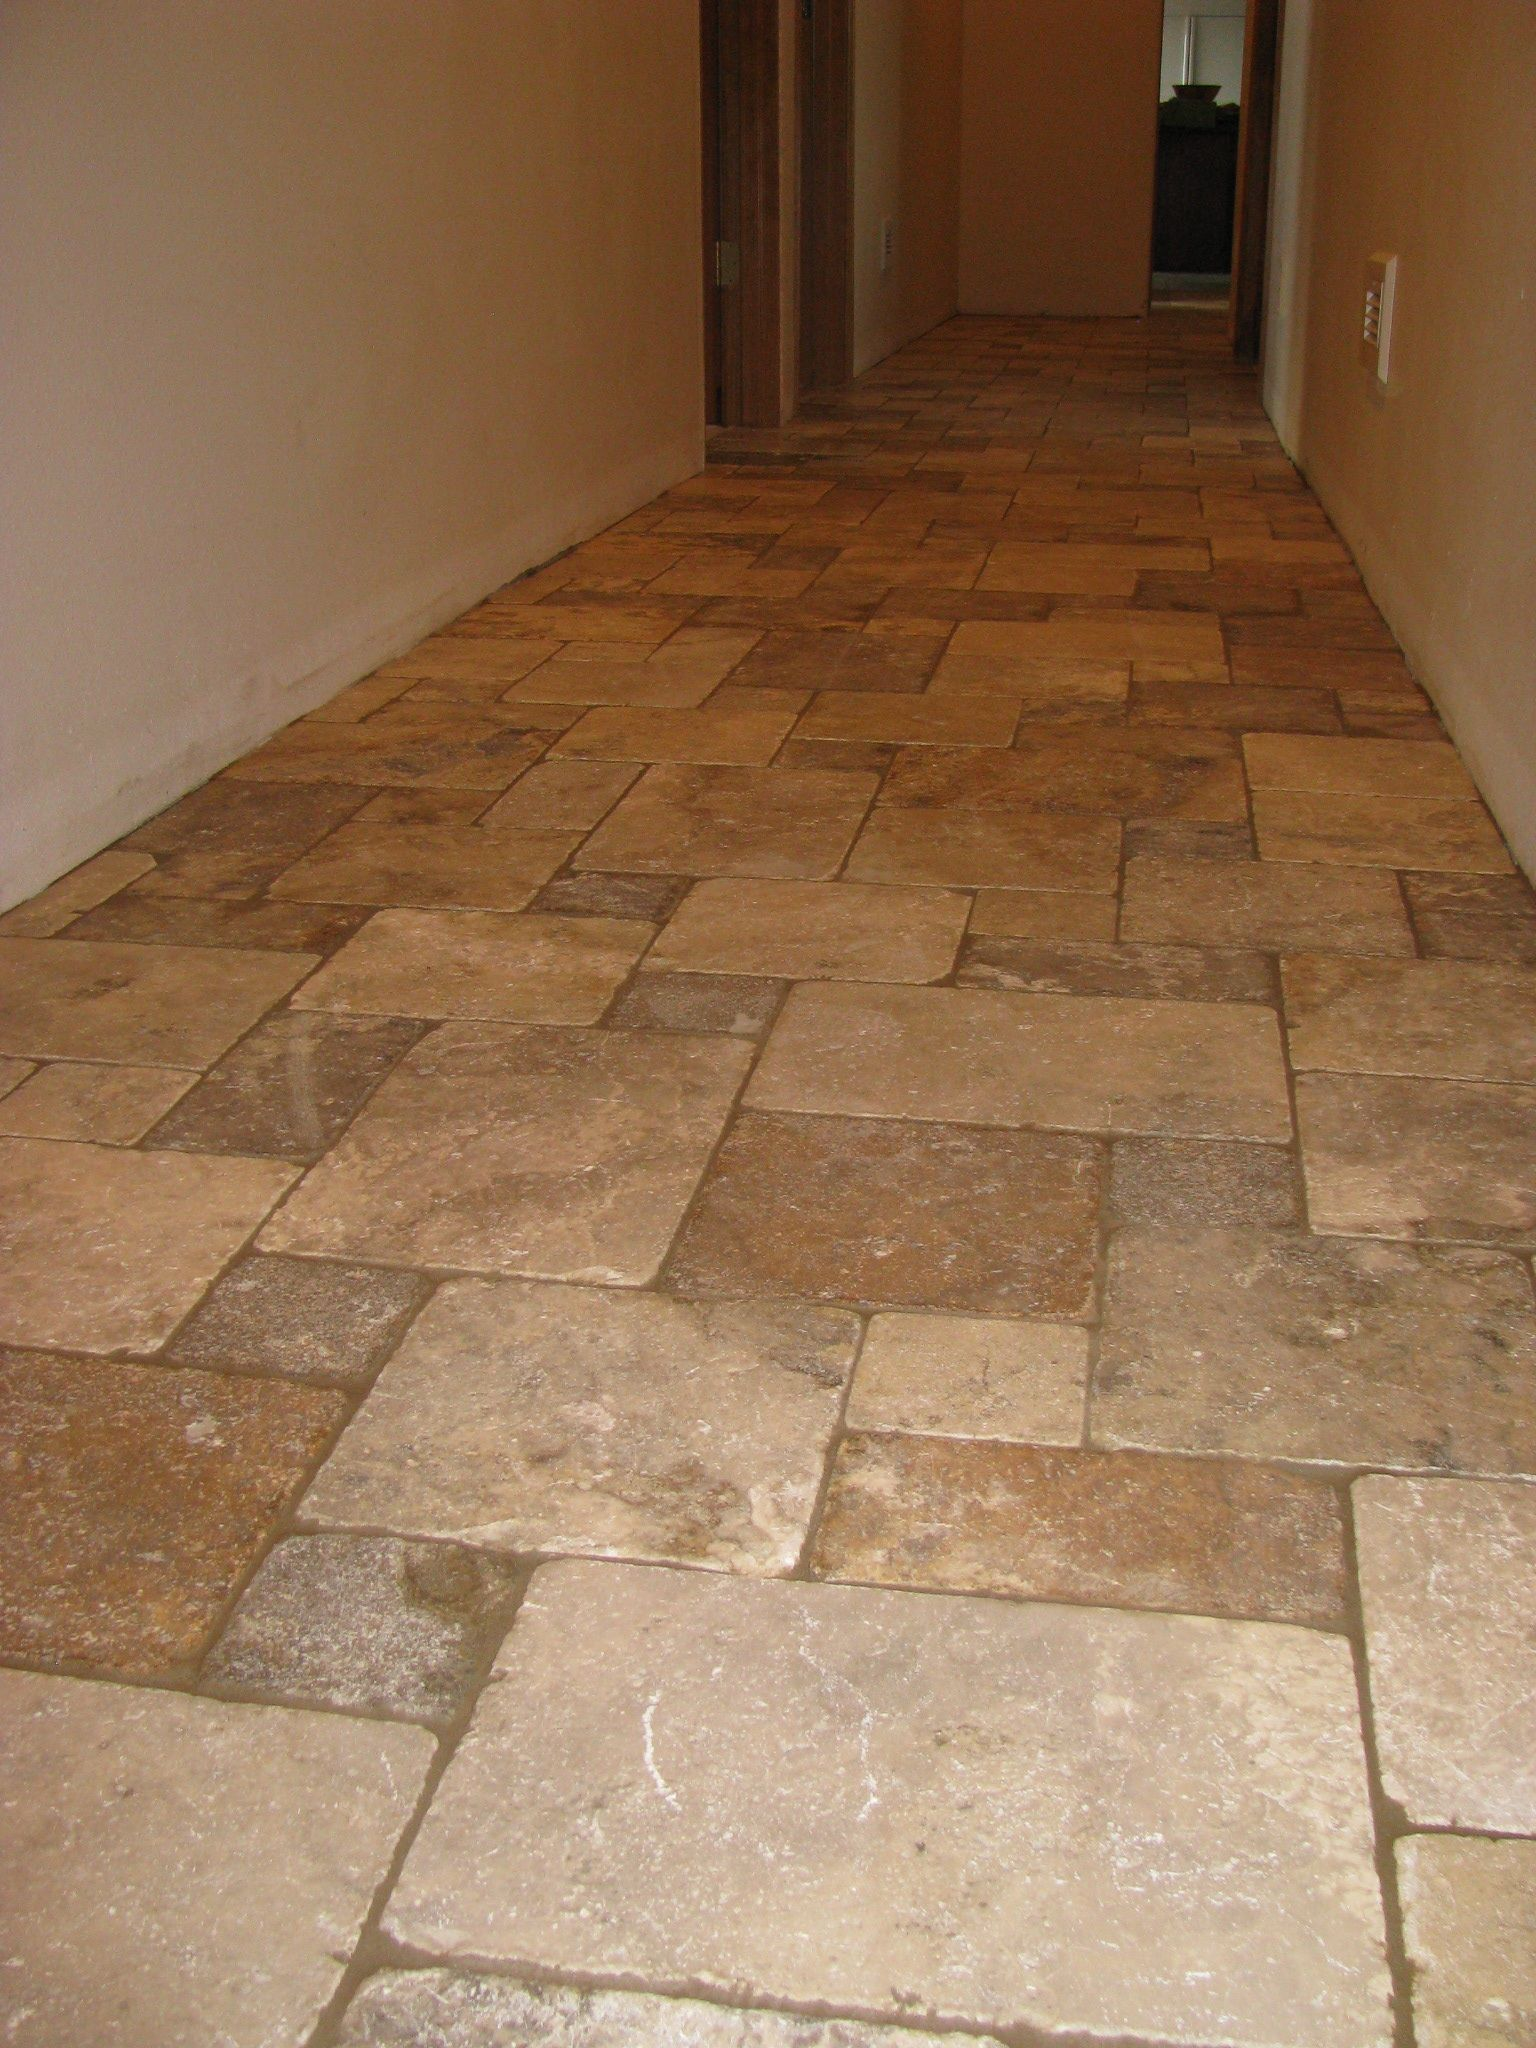 Travertine flooring tumbled travertine floor asymmetrical amazing travertine floor tile 1536 x 2048 951 kb jpeg dailygadgetfo Gallery